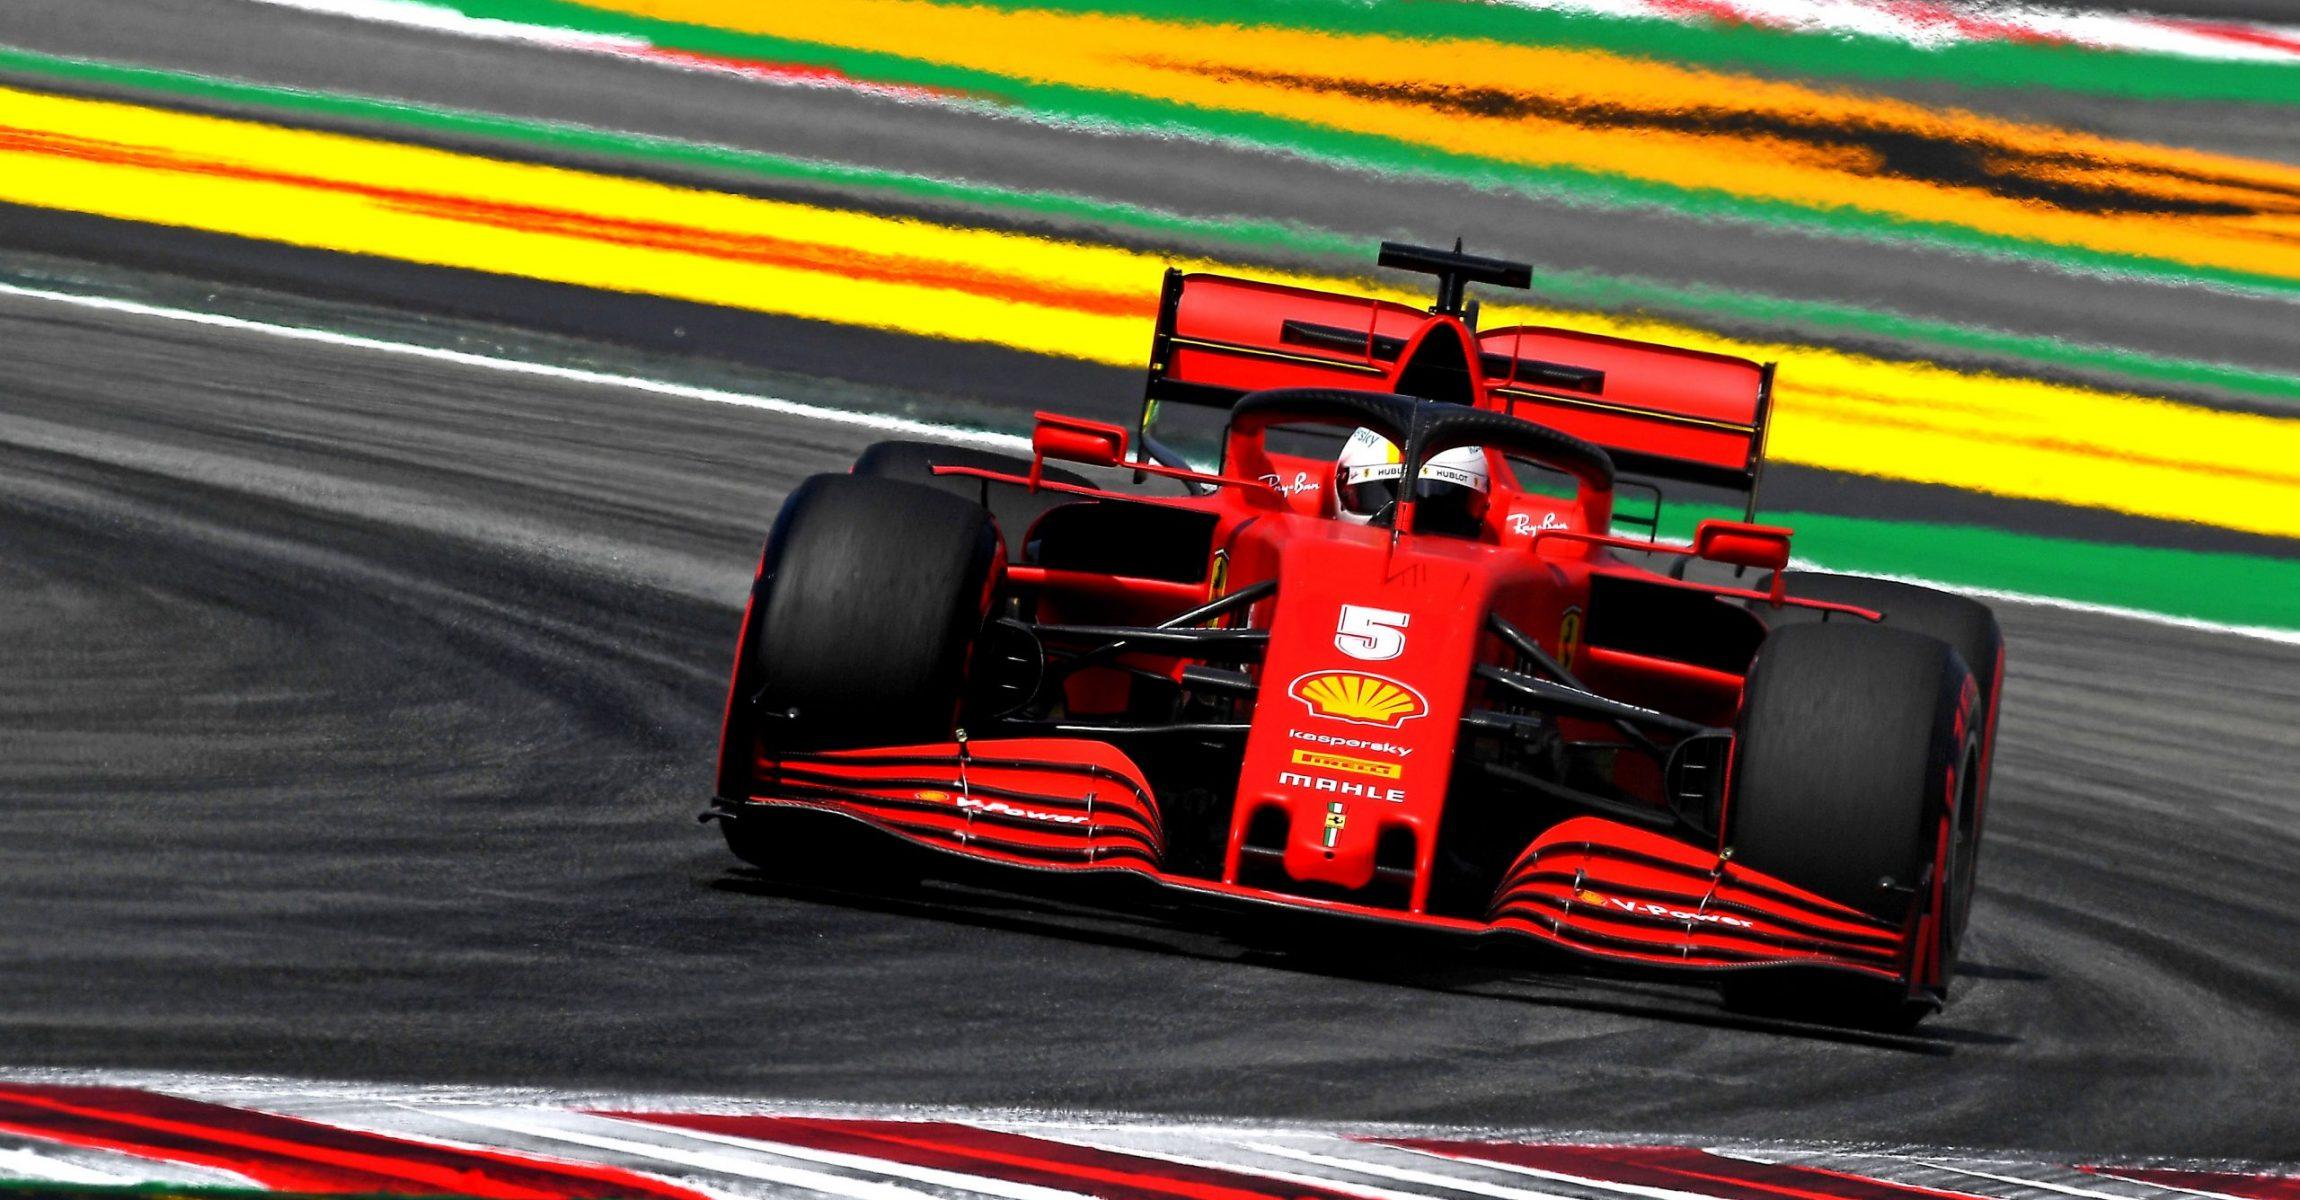 GP SPAGNA F1/2020 -  VENERDÌ 14/08/2020  credit: @Scuderia Ferrari Press Office Sebastian Vettel